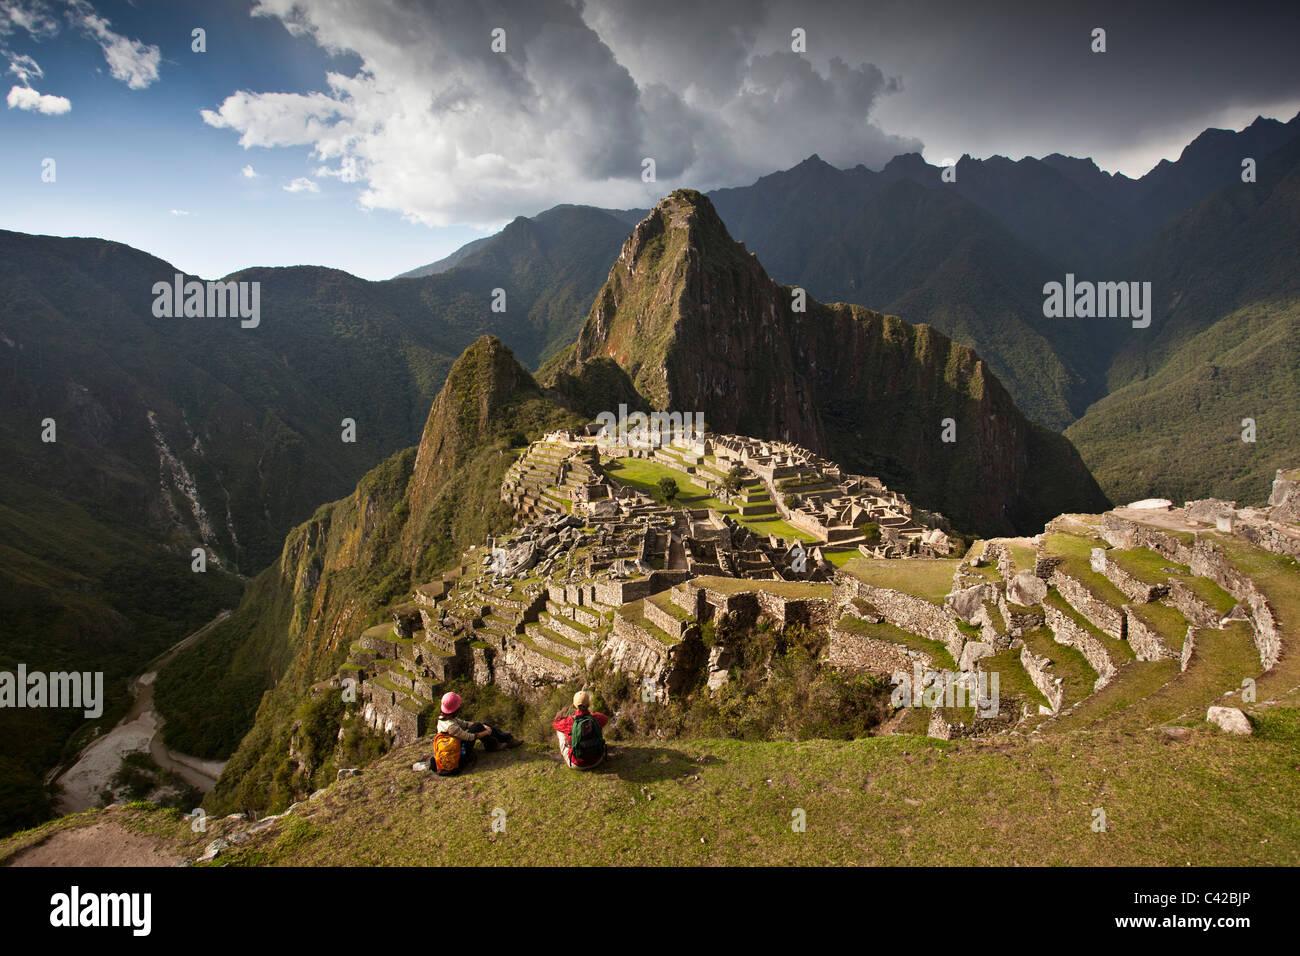 Peru, 15th-century Inca site located 2,430 metres (7,970 ft) above sea level. Tourists. - Stock Image